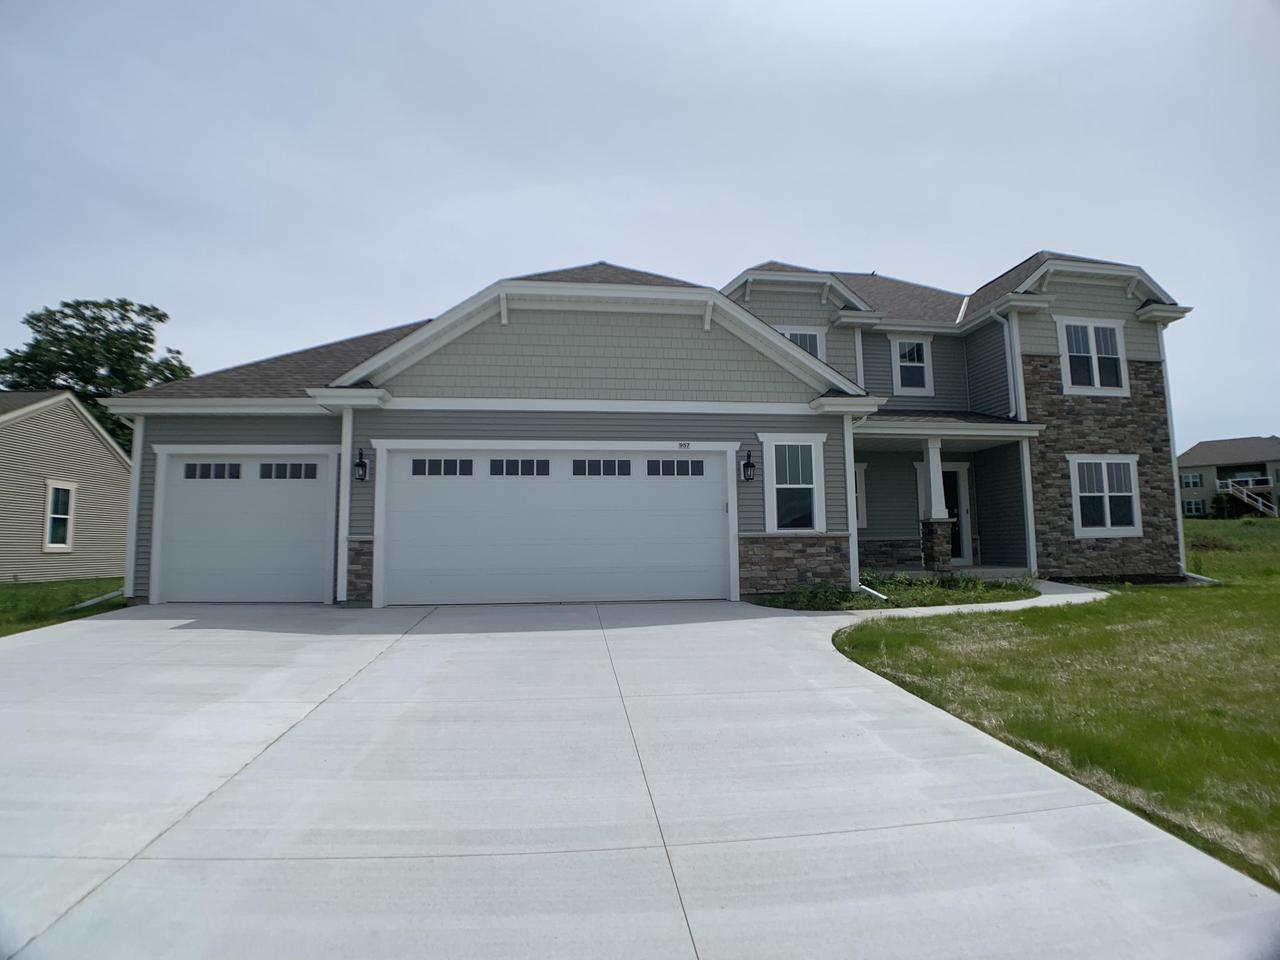 Seller Financed Homes for Sale in Hartford WI • Realty